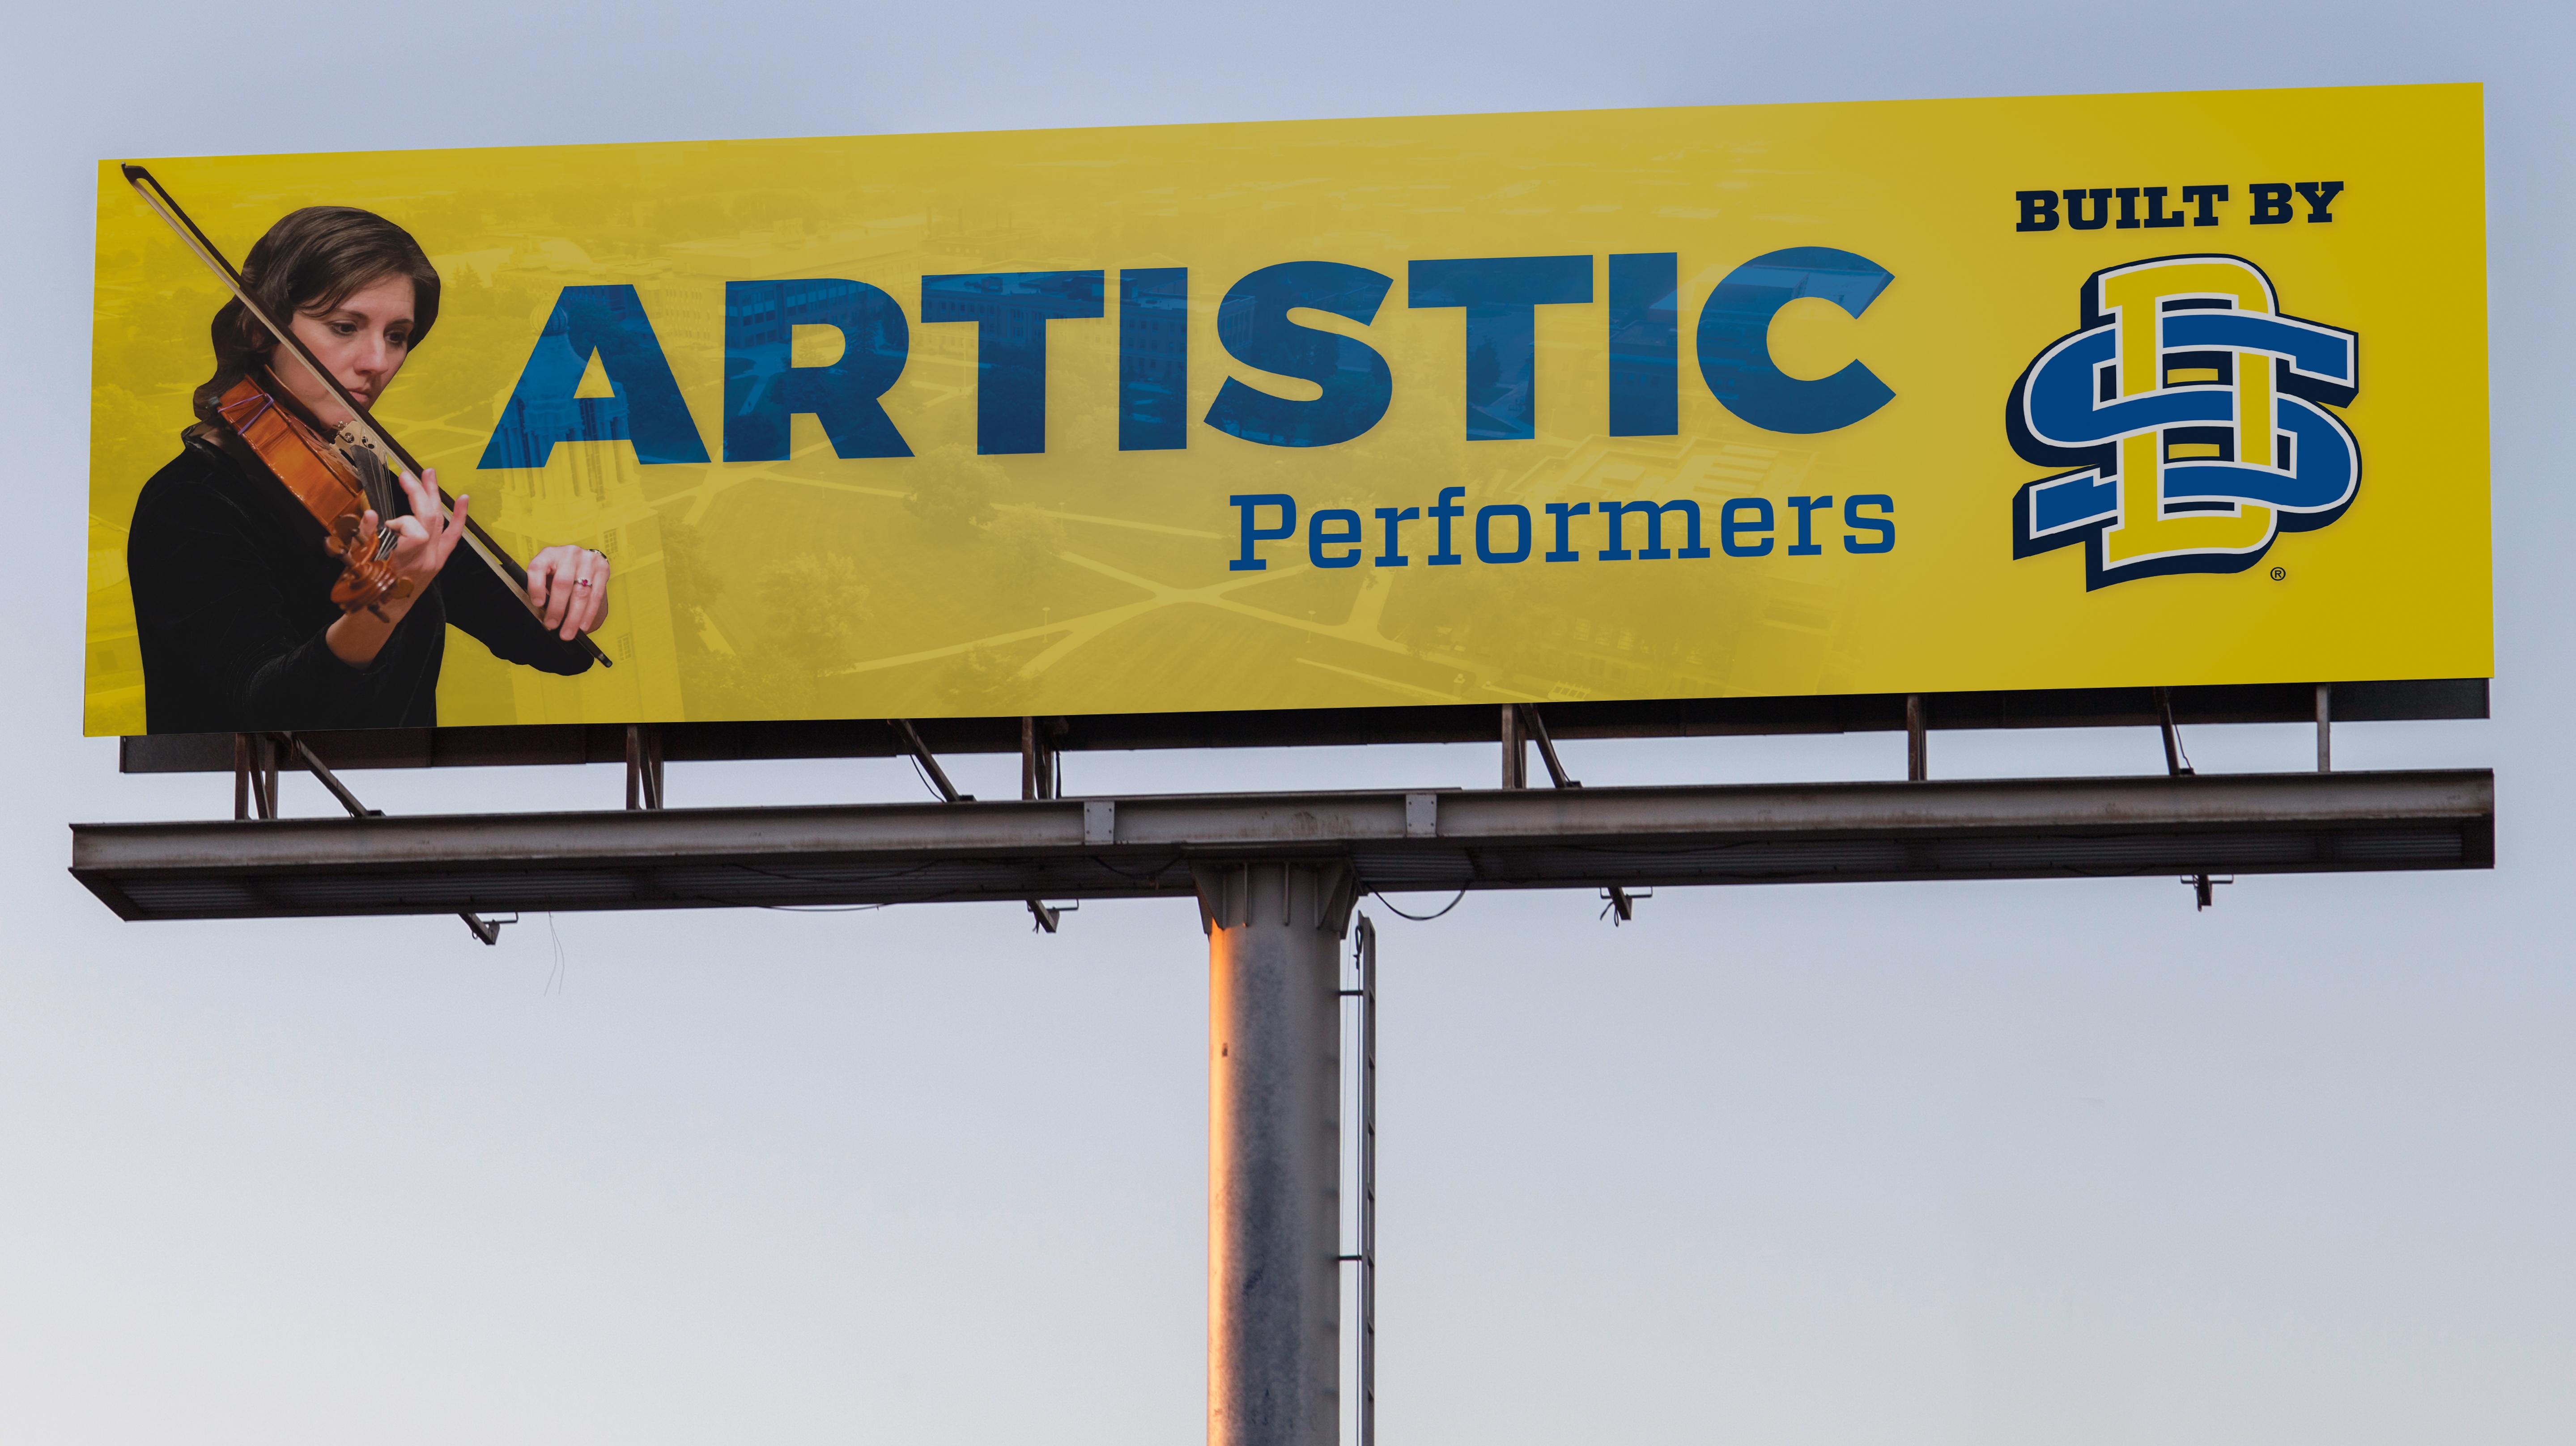 19_SDSU_UMC_Billboards_BuiltBySDSTATE_Artistic_14x48